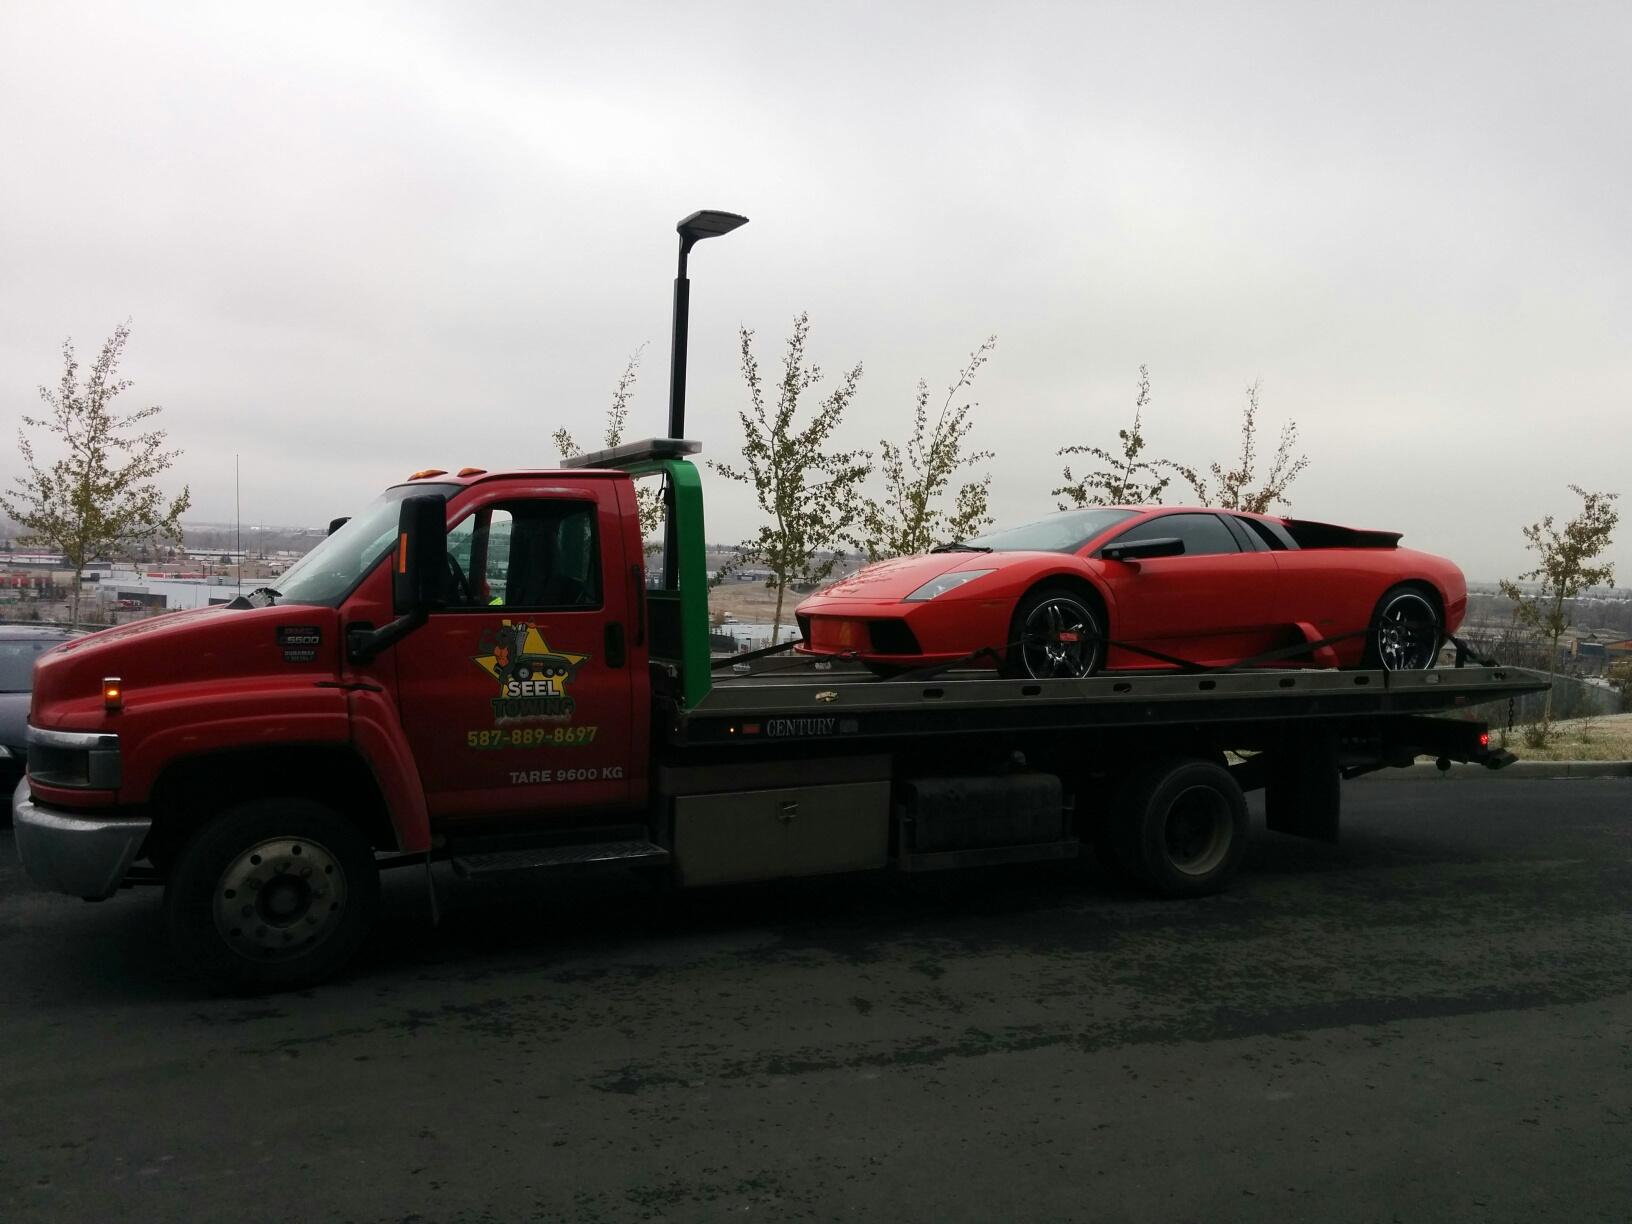 Towing 05 Lamborghini Murcielogo